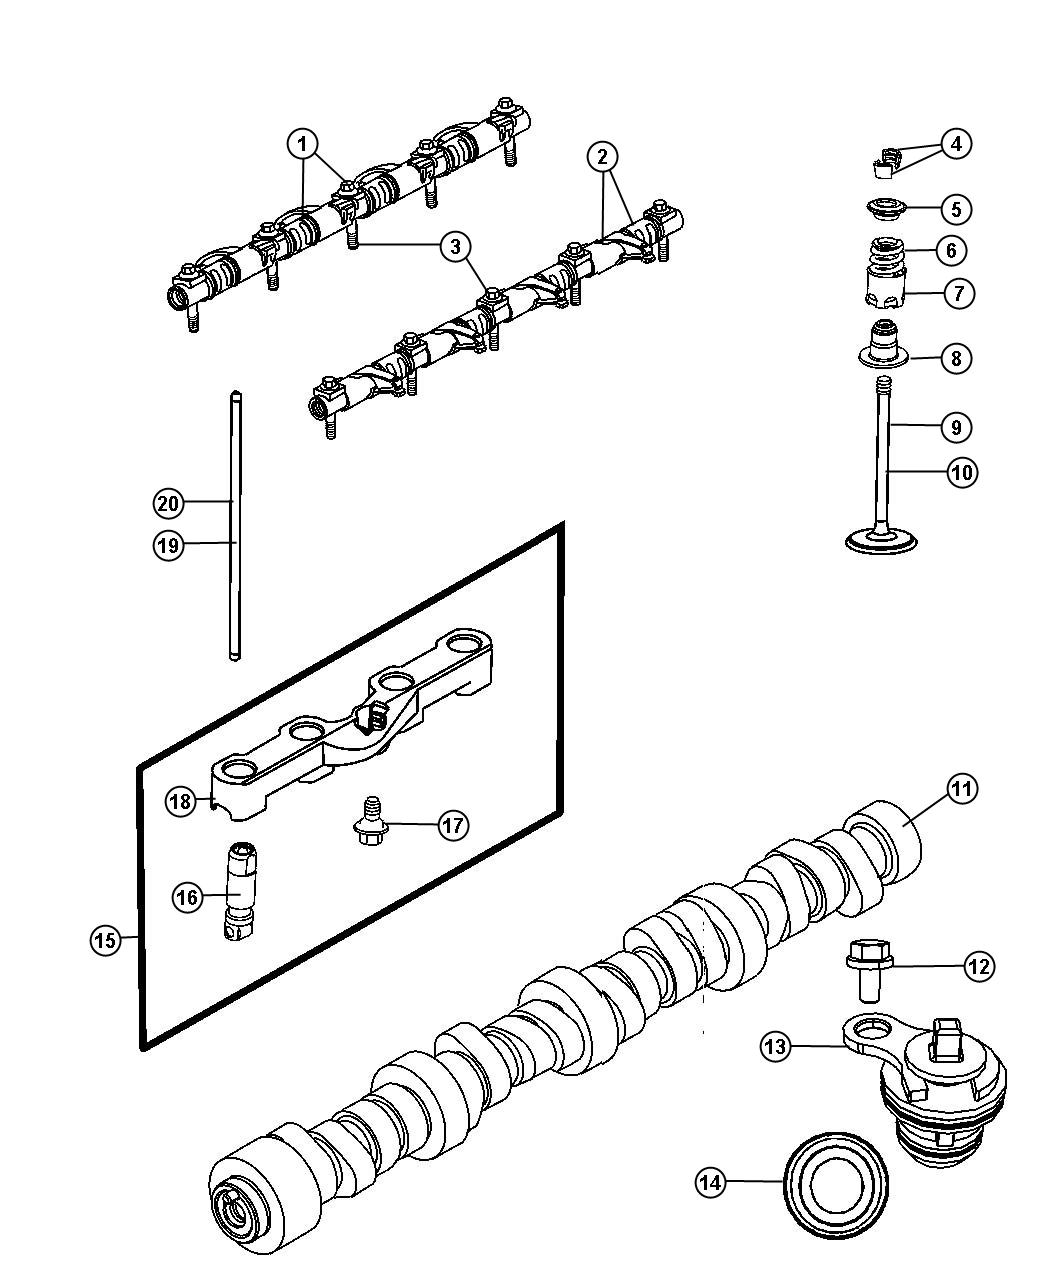 2008 Chrysler 300 Seal  Valve Guide  Exhaust  Intake